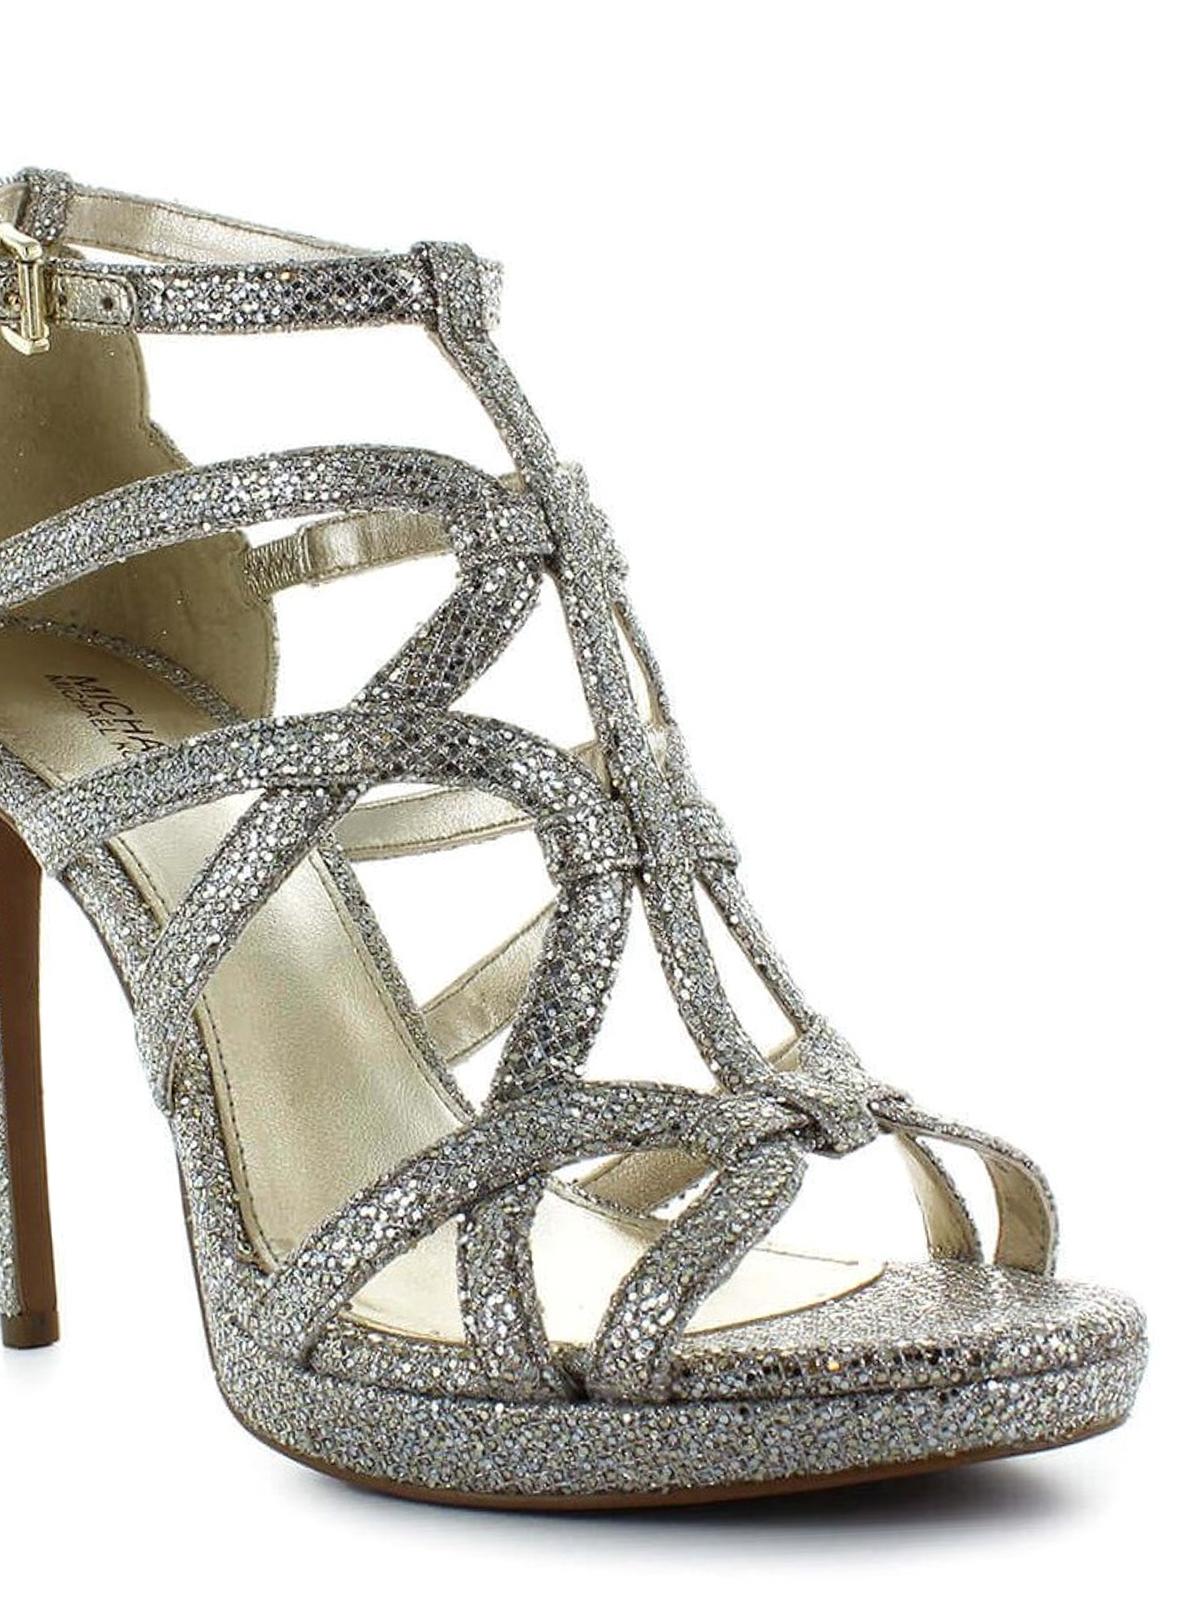 Design Sandra Michael Glitter Heeled Cage Kors Sandals cALq5j43RS